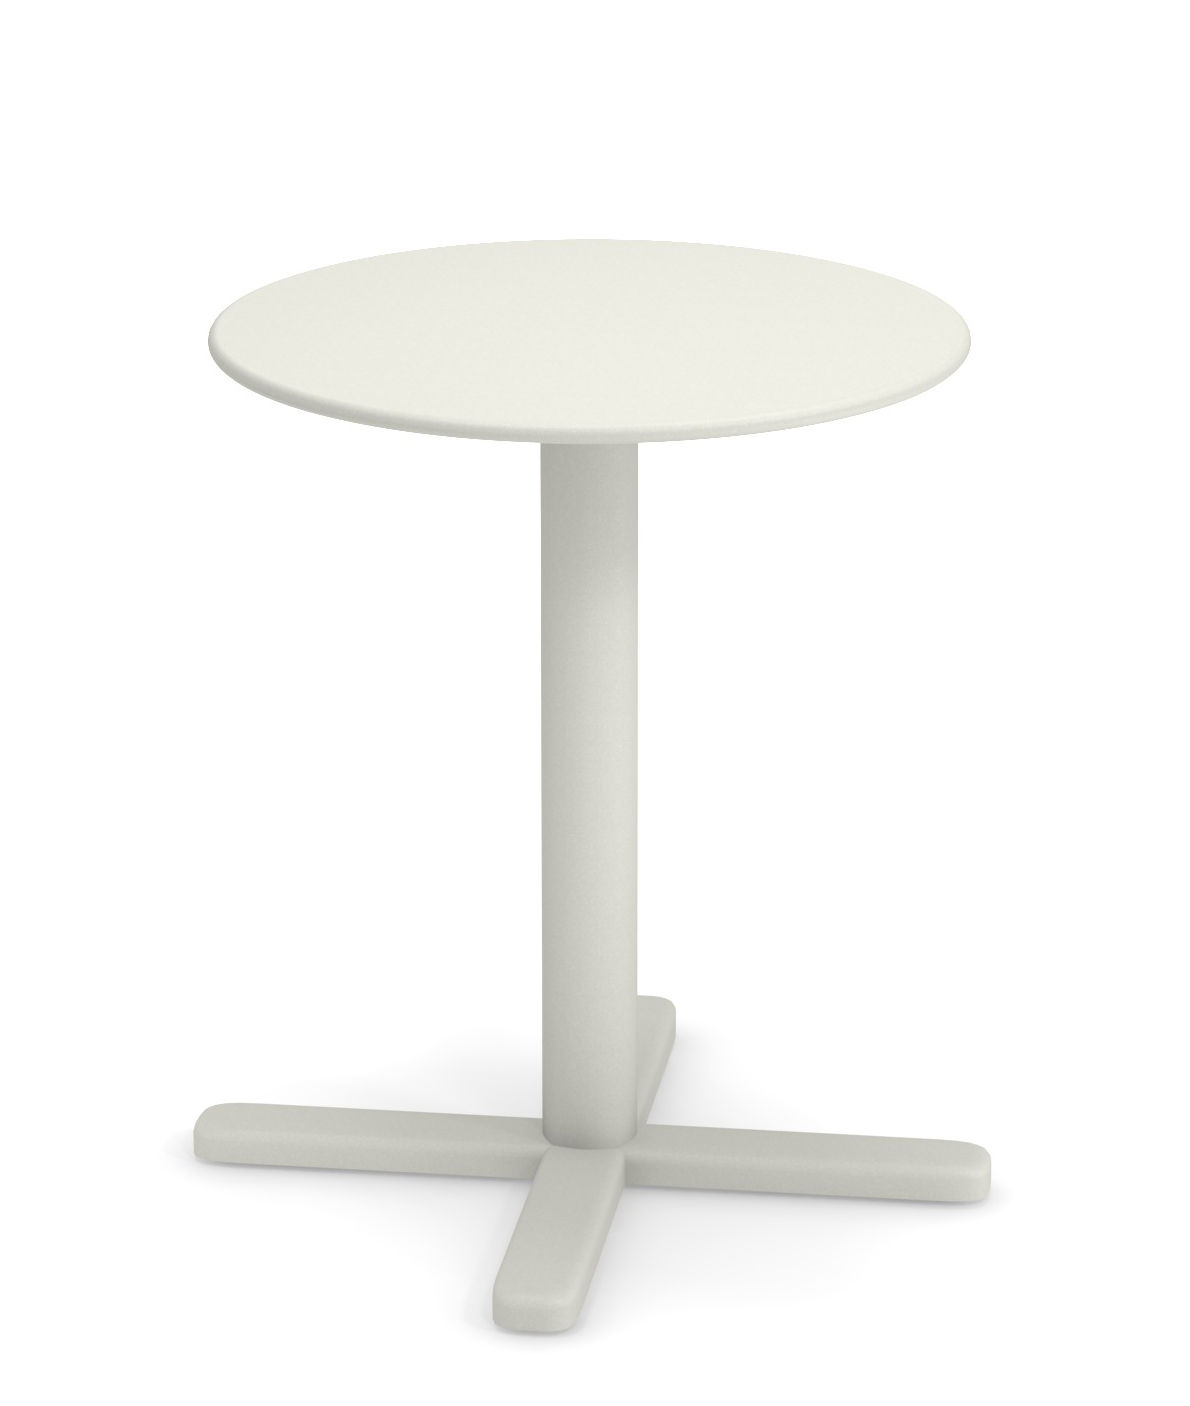 Jardin - Tables de jardin - Table pliante Darwin / Ø 60 cm - Emu - Blanc - Acier verni